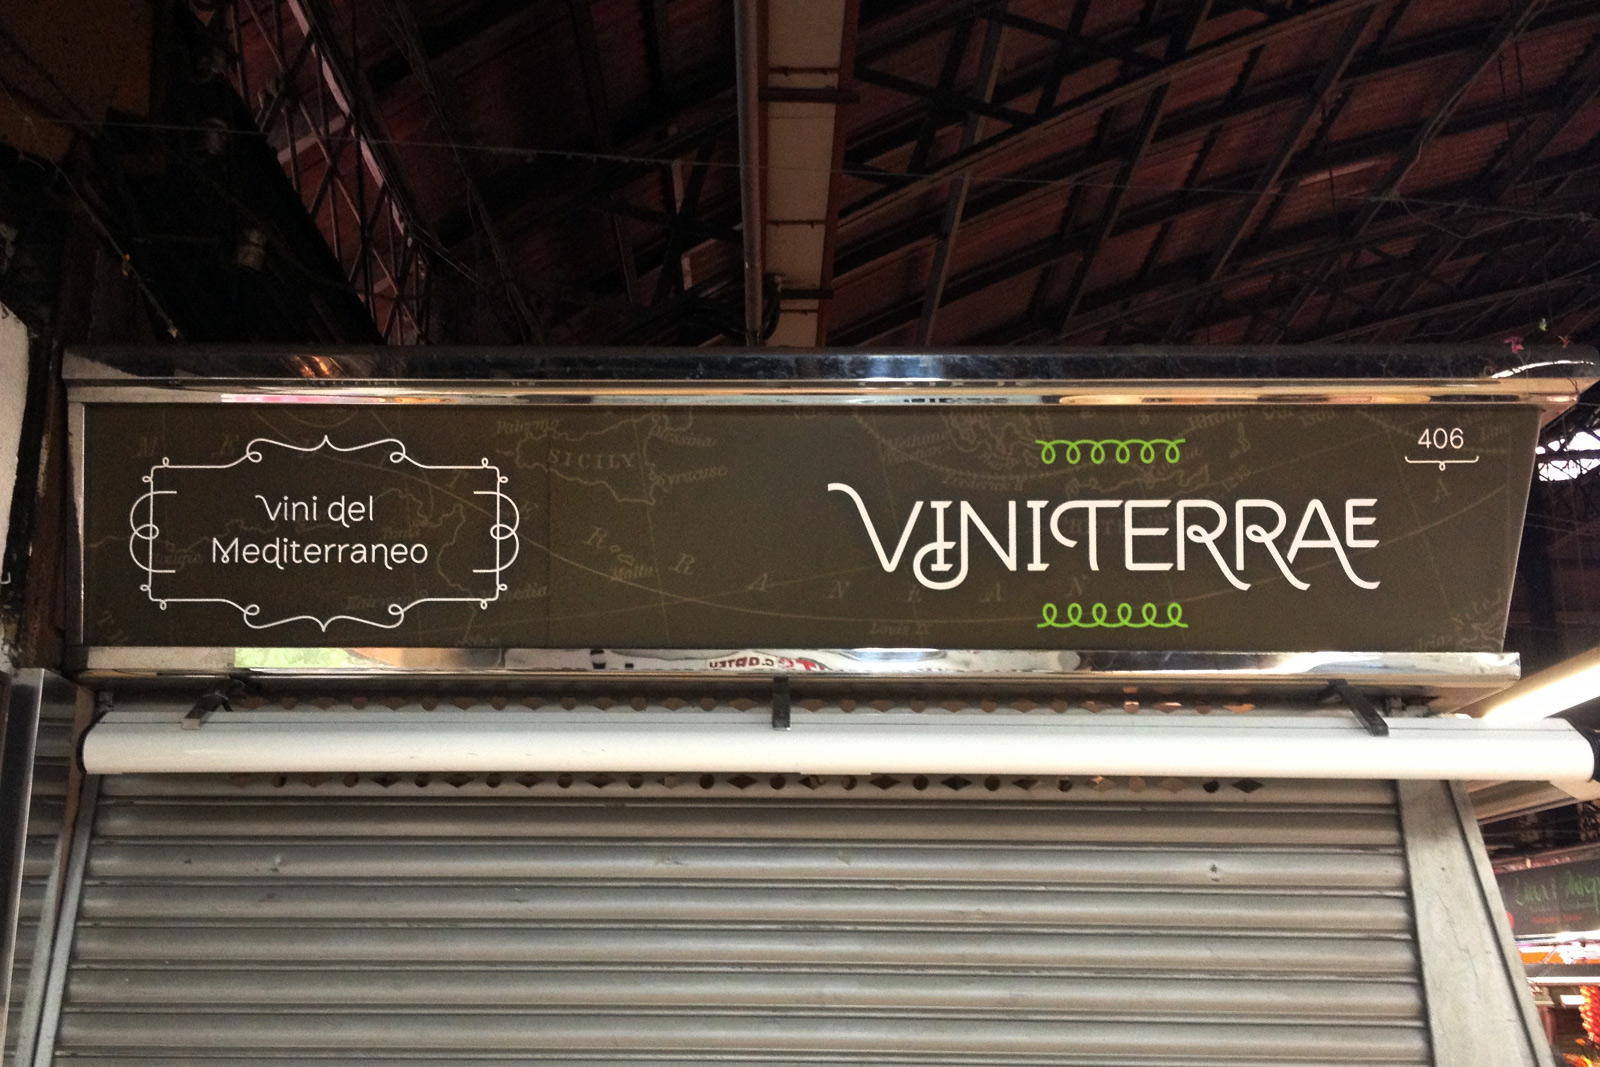 ViniTerrae signboard